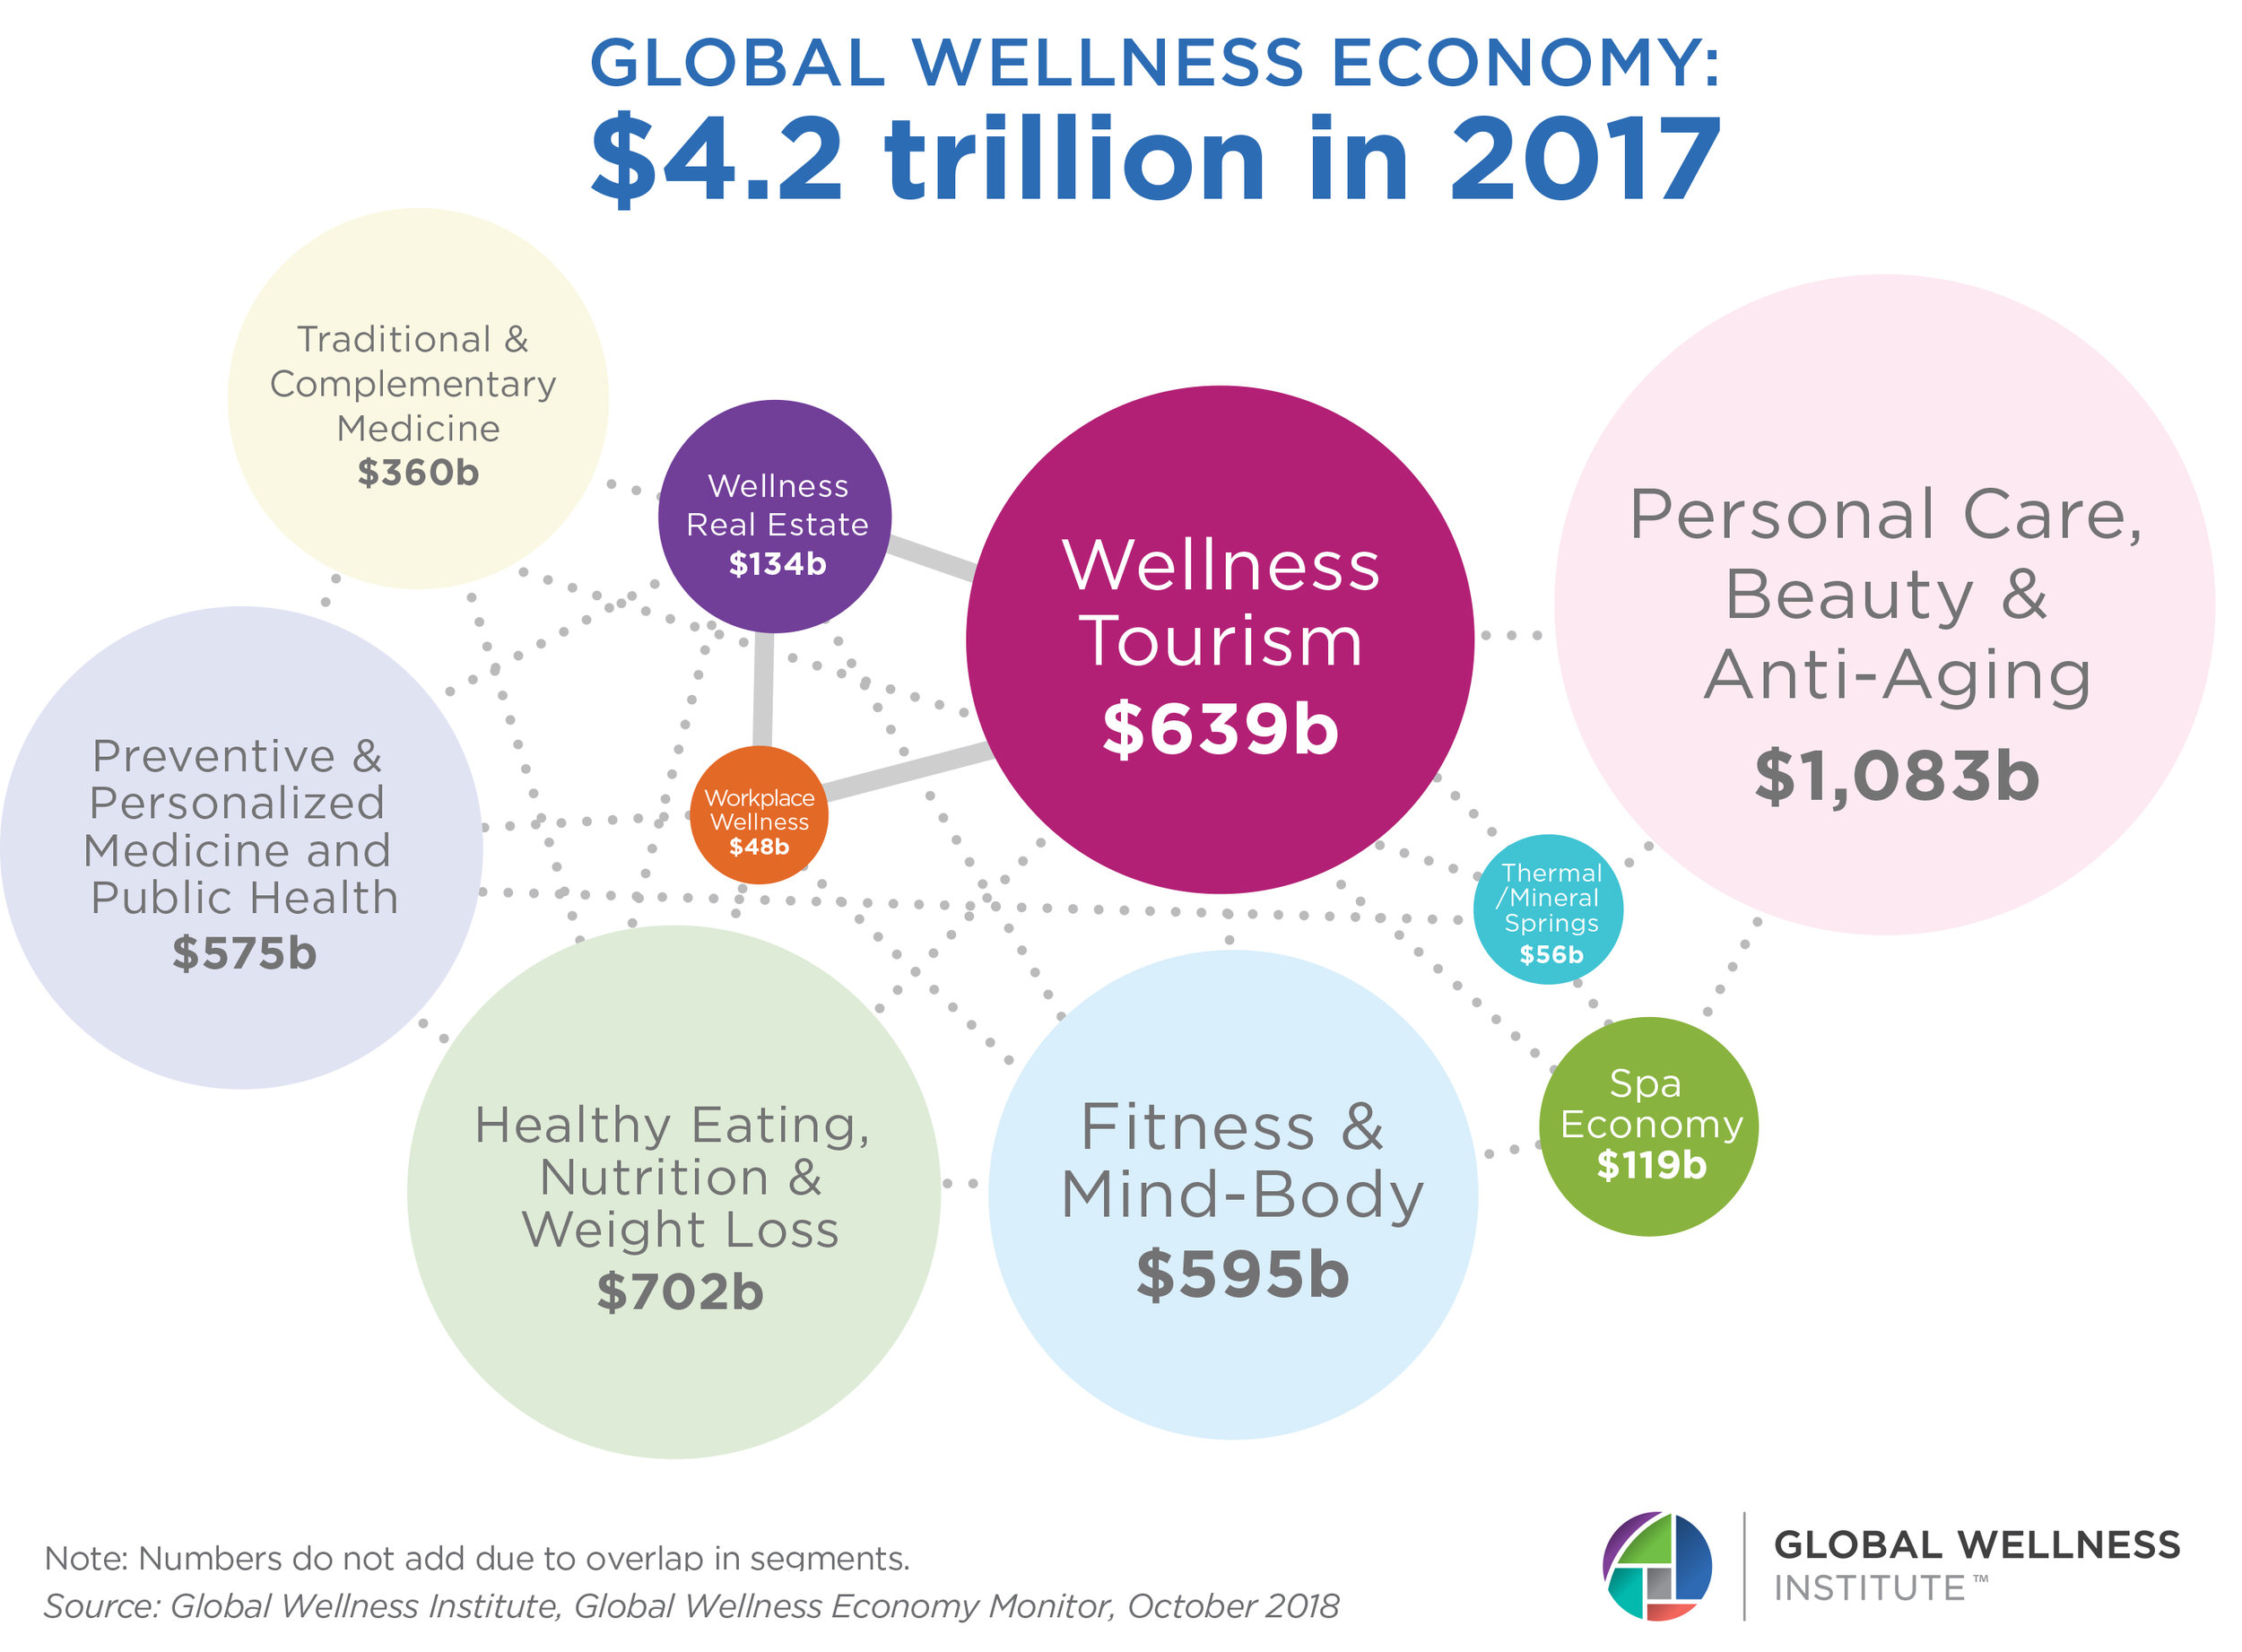 GWI_globalwellnesseconomy2017.jpg